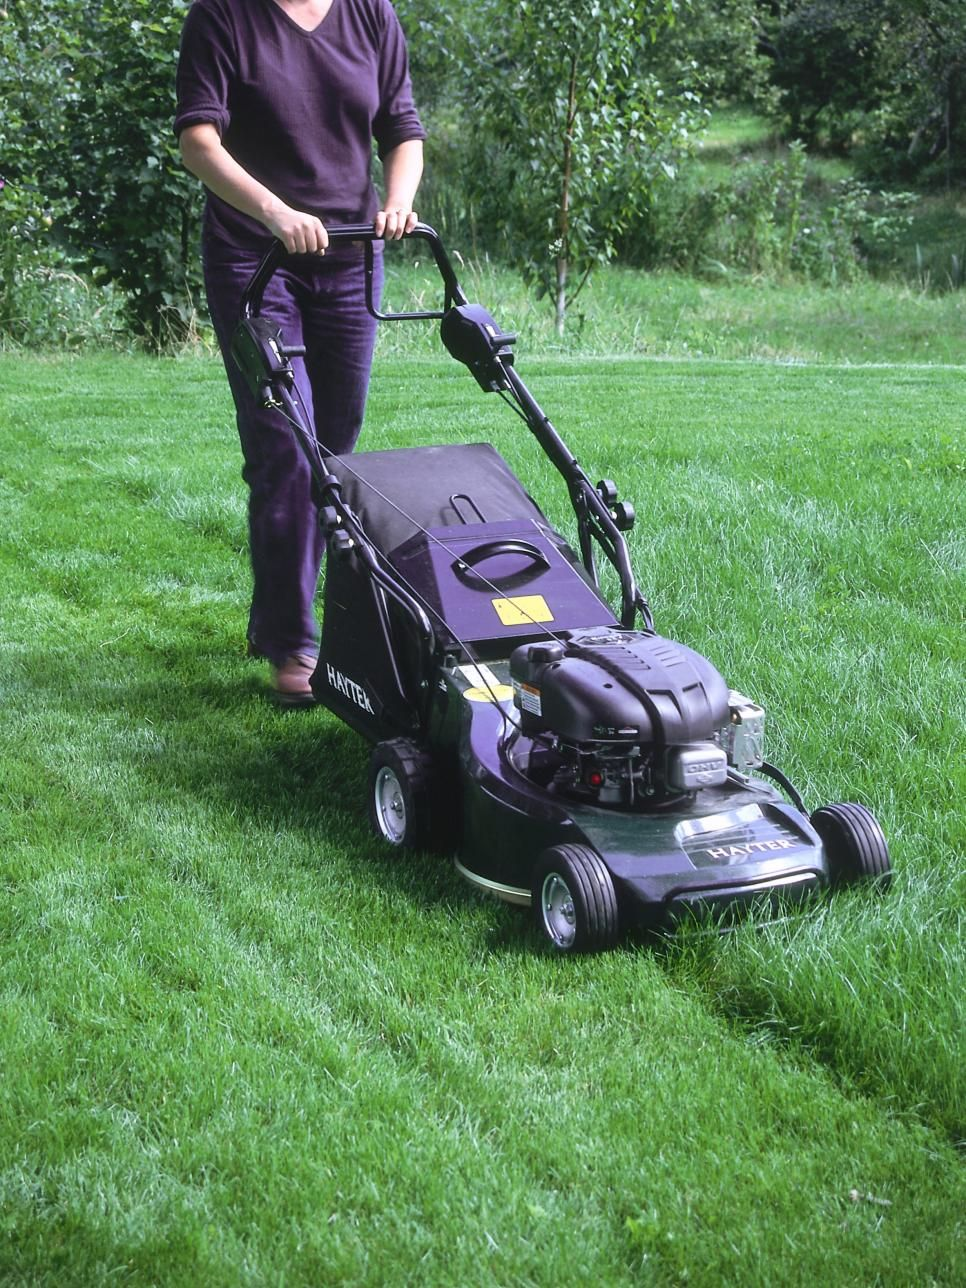 15 Year Round Lawn Care Tips Lawn Care Tips Lawn Care Lawn